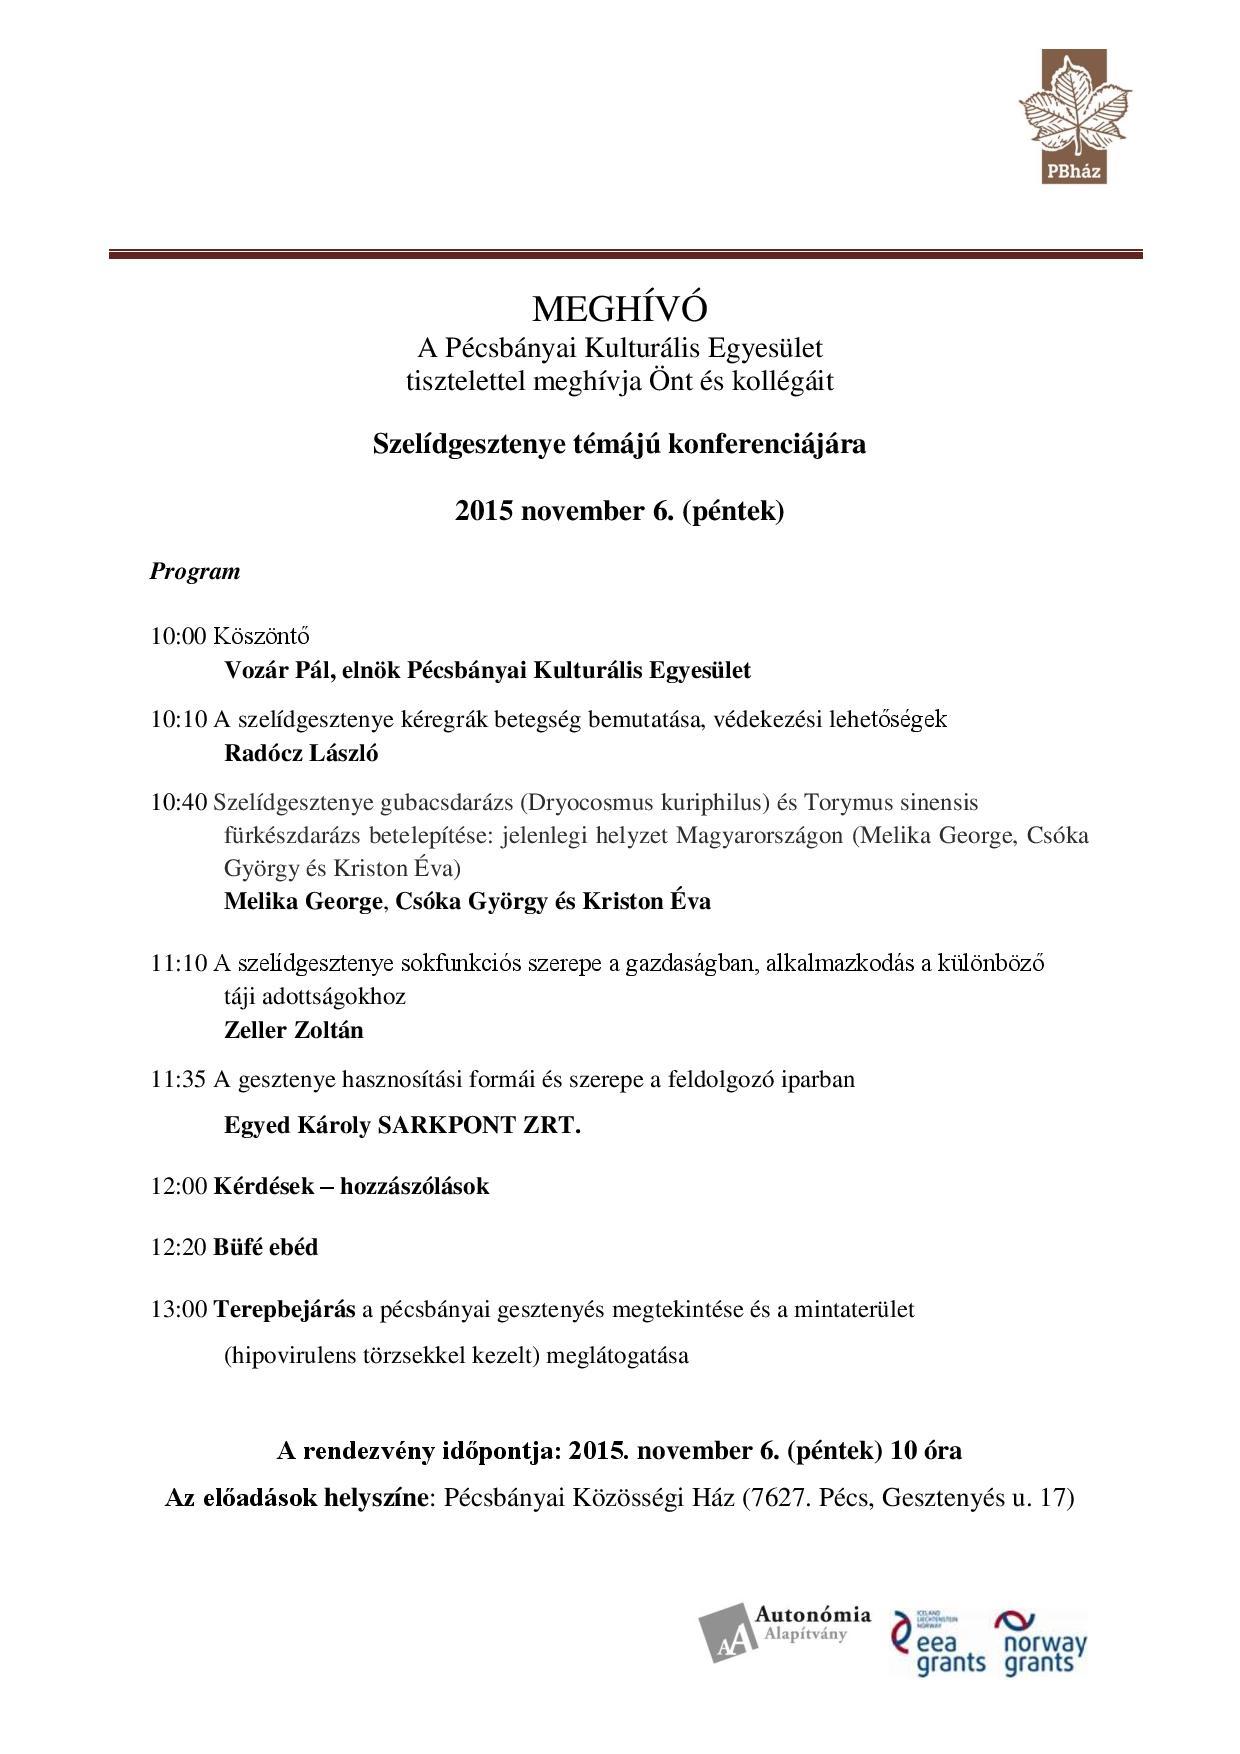 meghivo_gesztenye rendezvény  20151106.-page-001